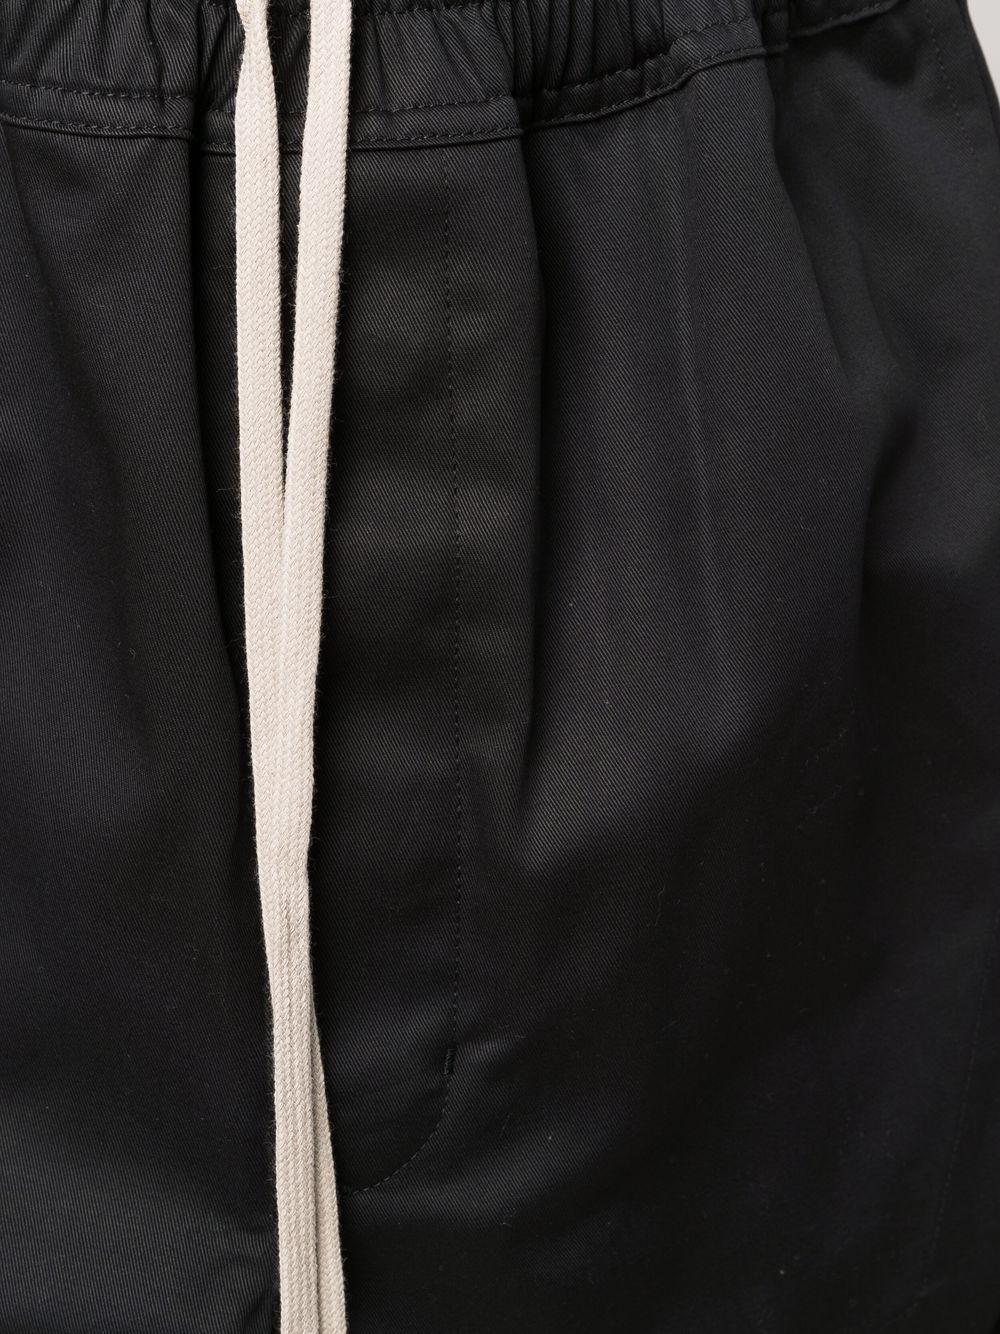 SHORTS DRKSHDW   Shorts   DS02A3321TW09